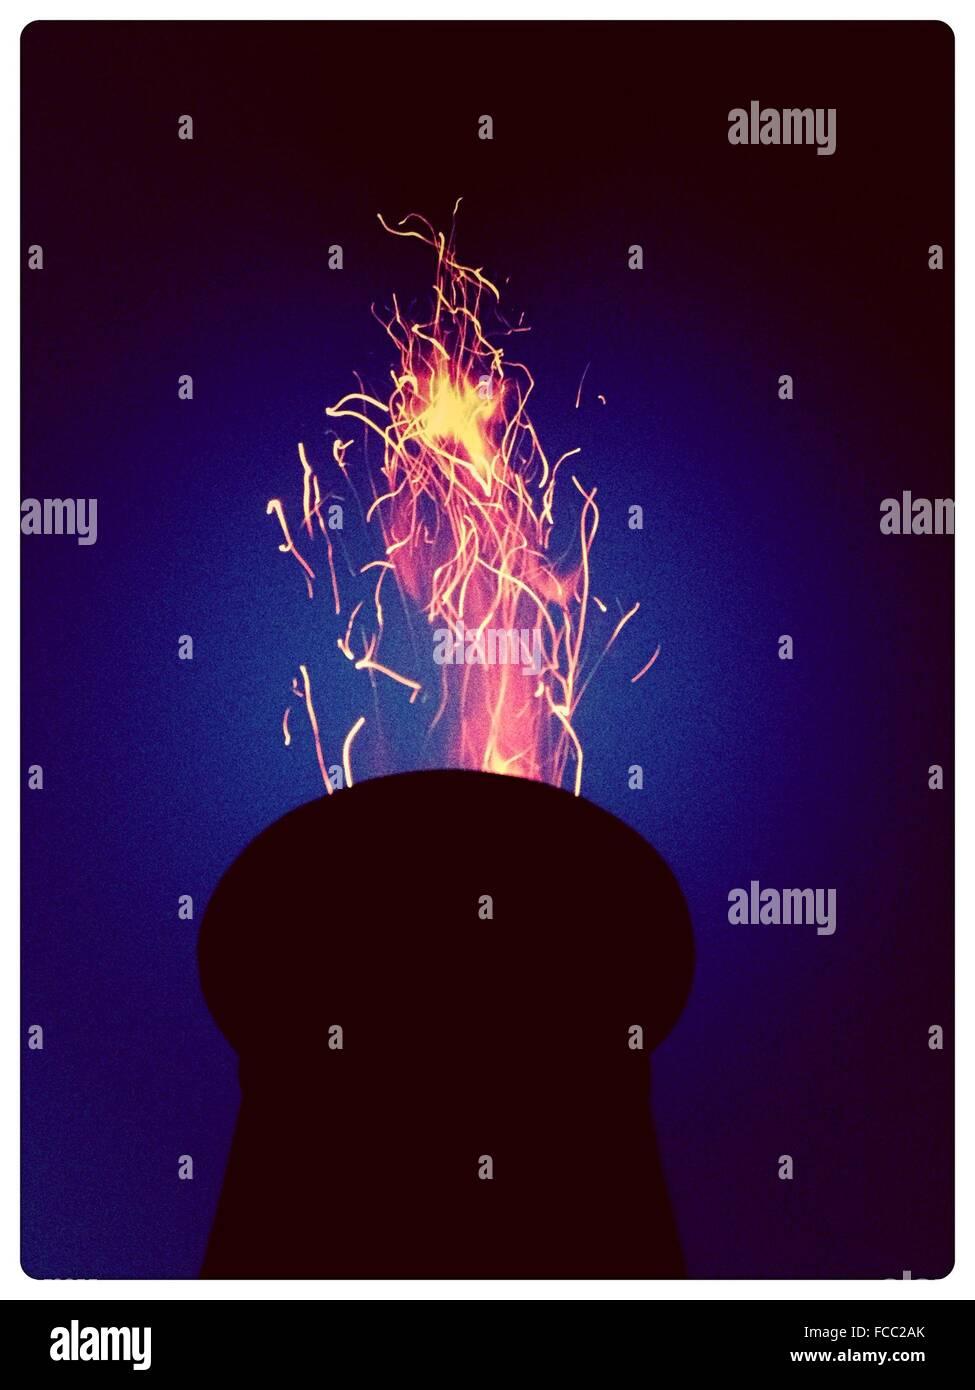 Flames At Night - Stock Image